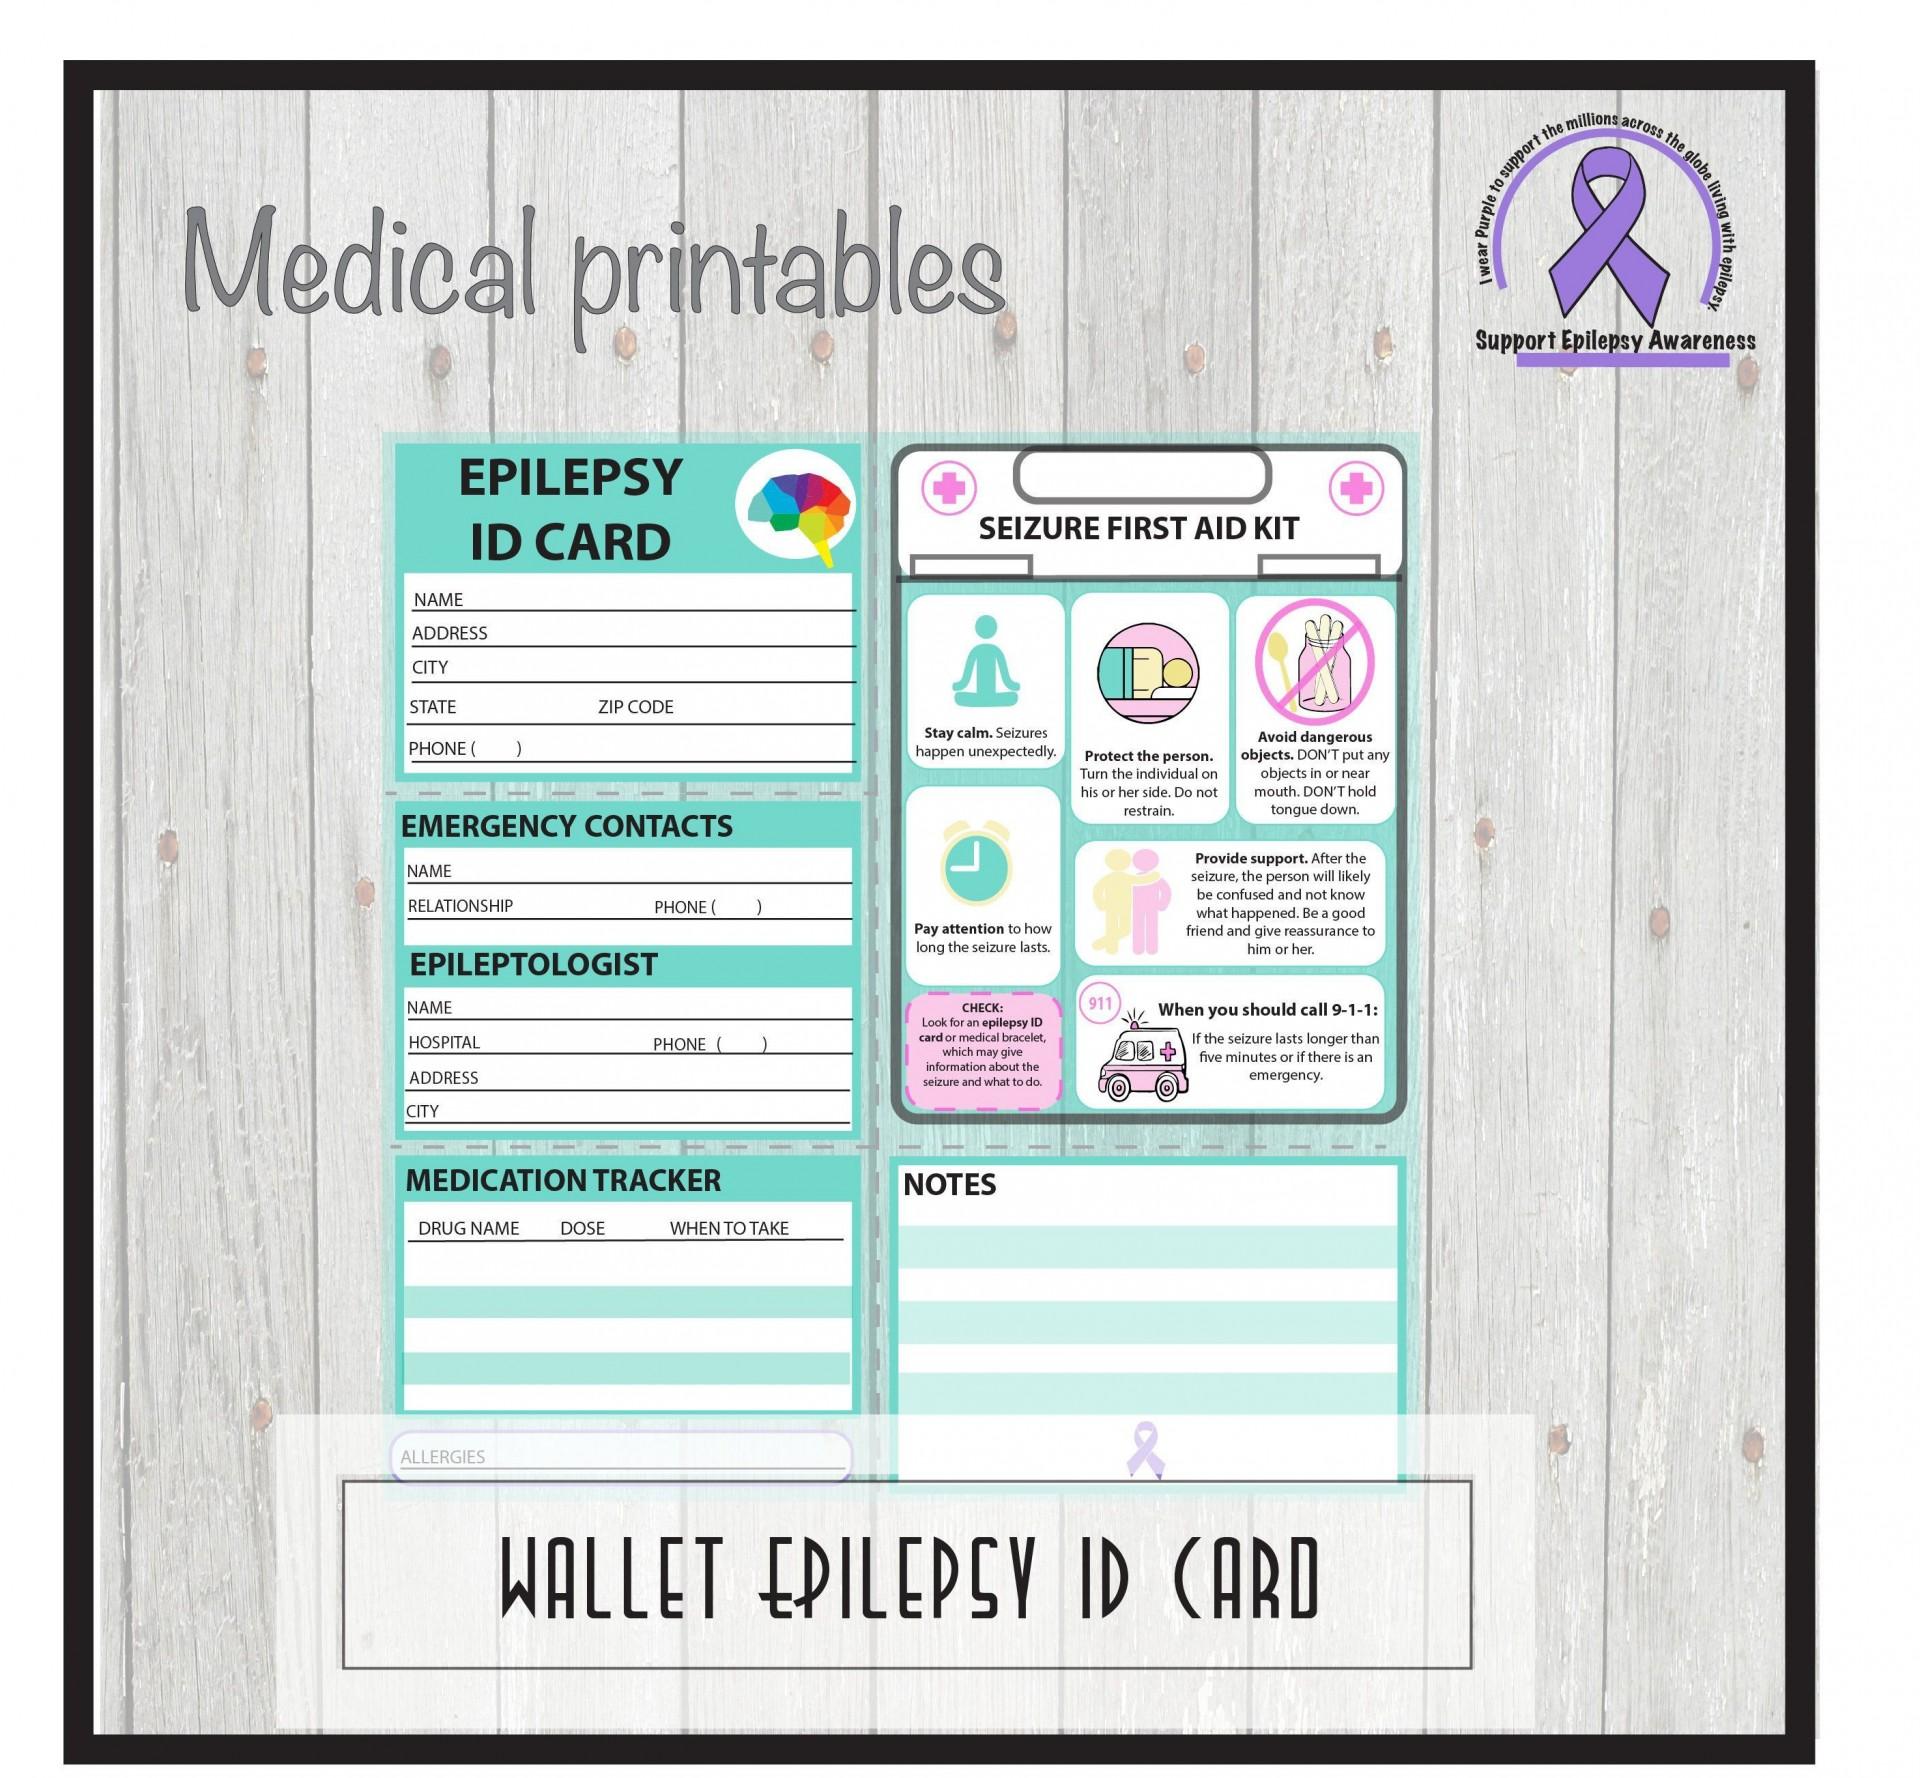 001 Marvelou Medical Wallet Card Template Idea  Free Alert Canada Information1920